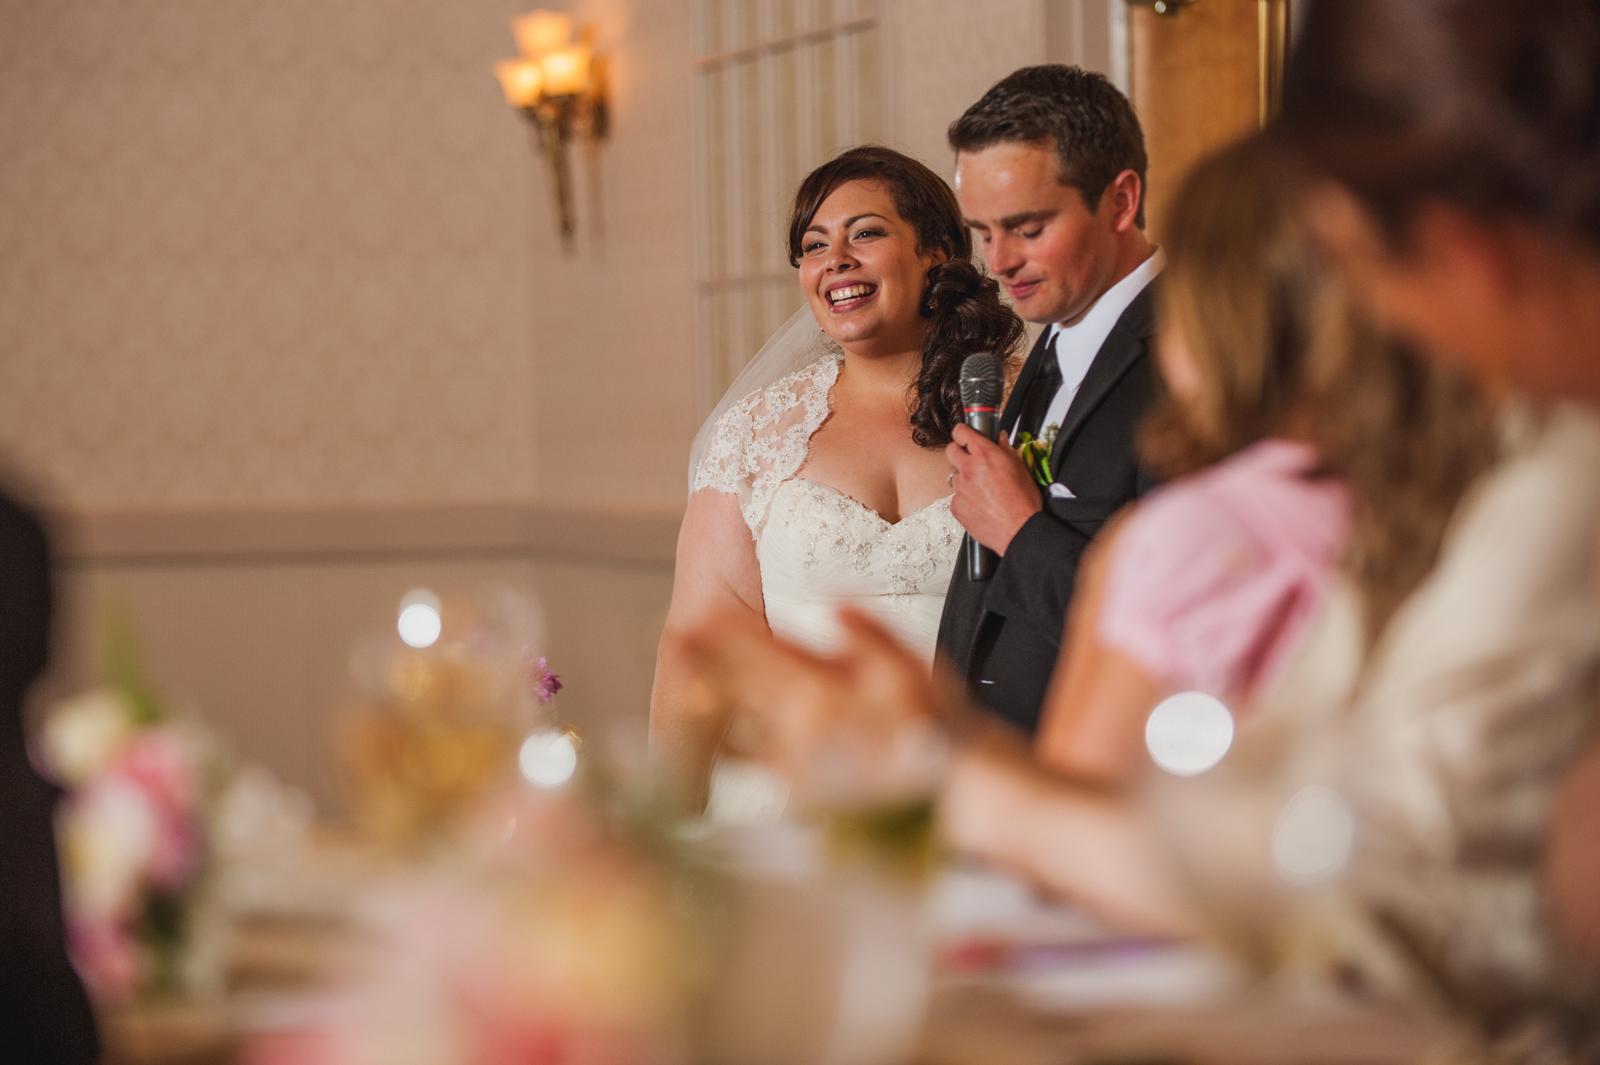 bc-wedding-photographers-harrison-lake-wedding-63.jpg